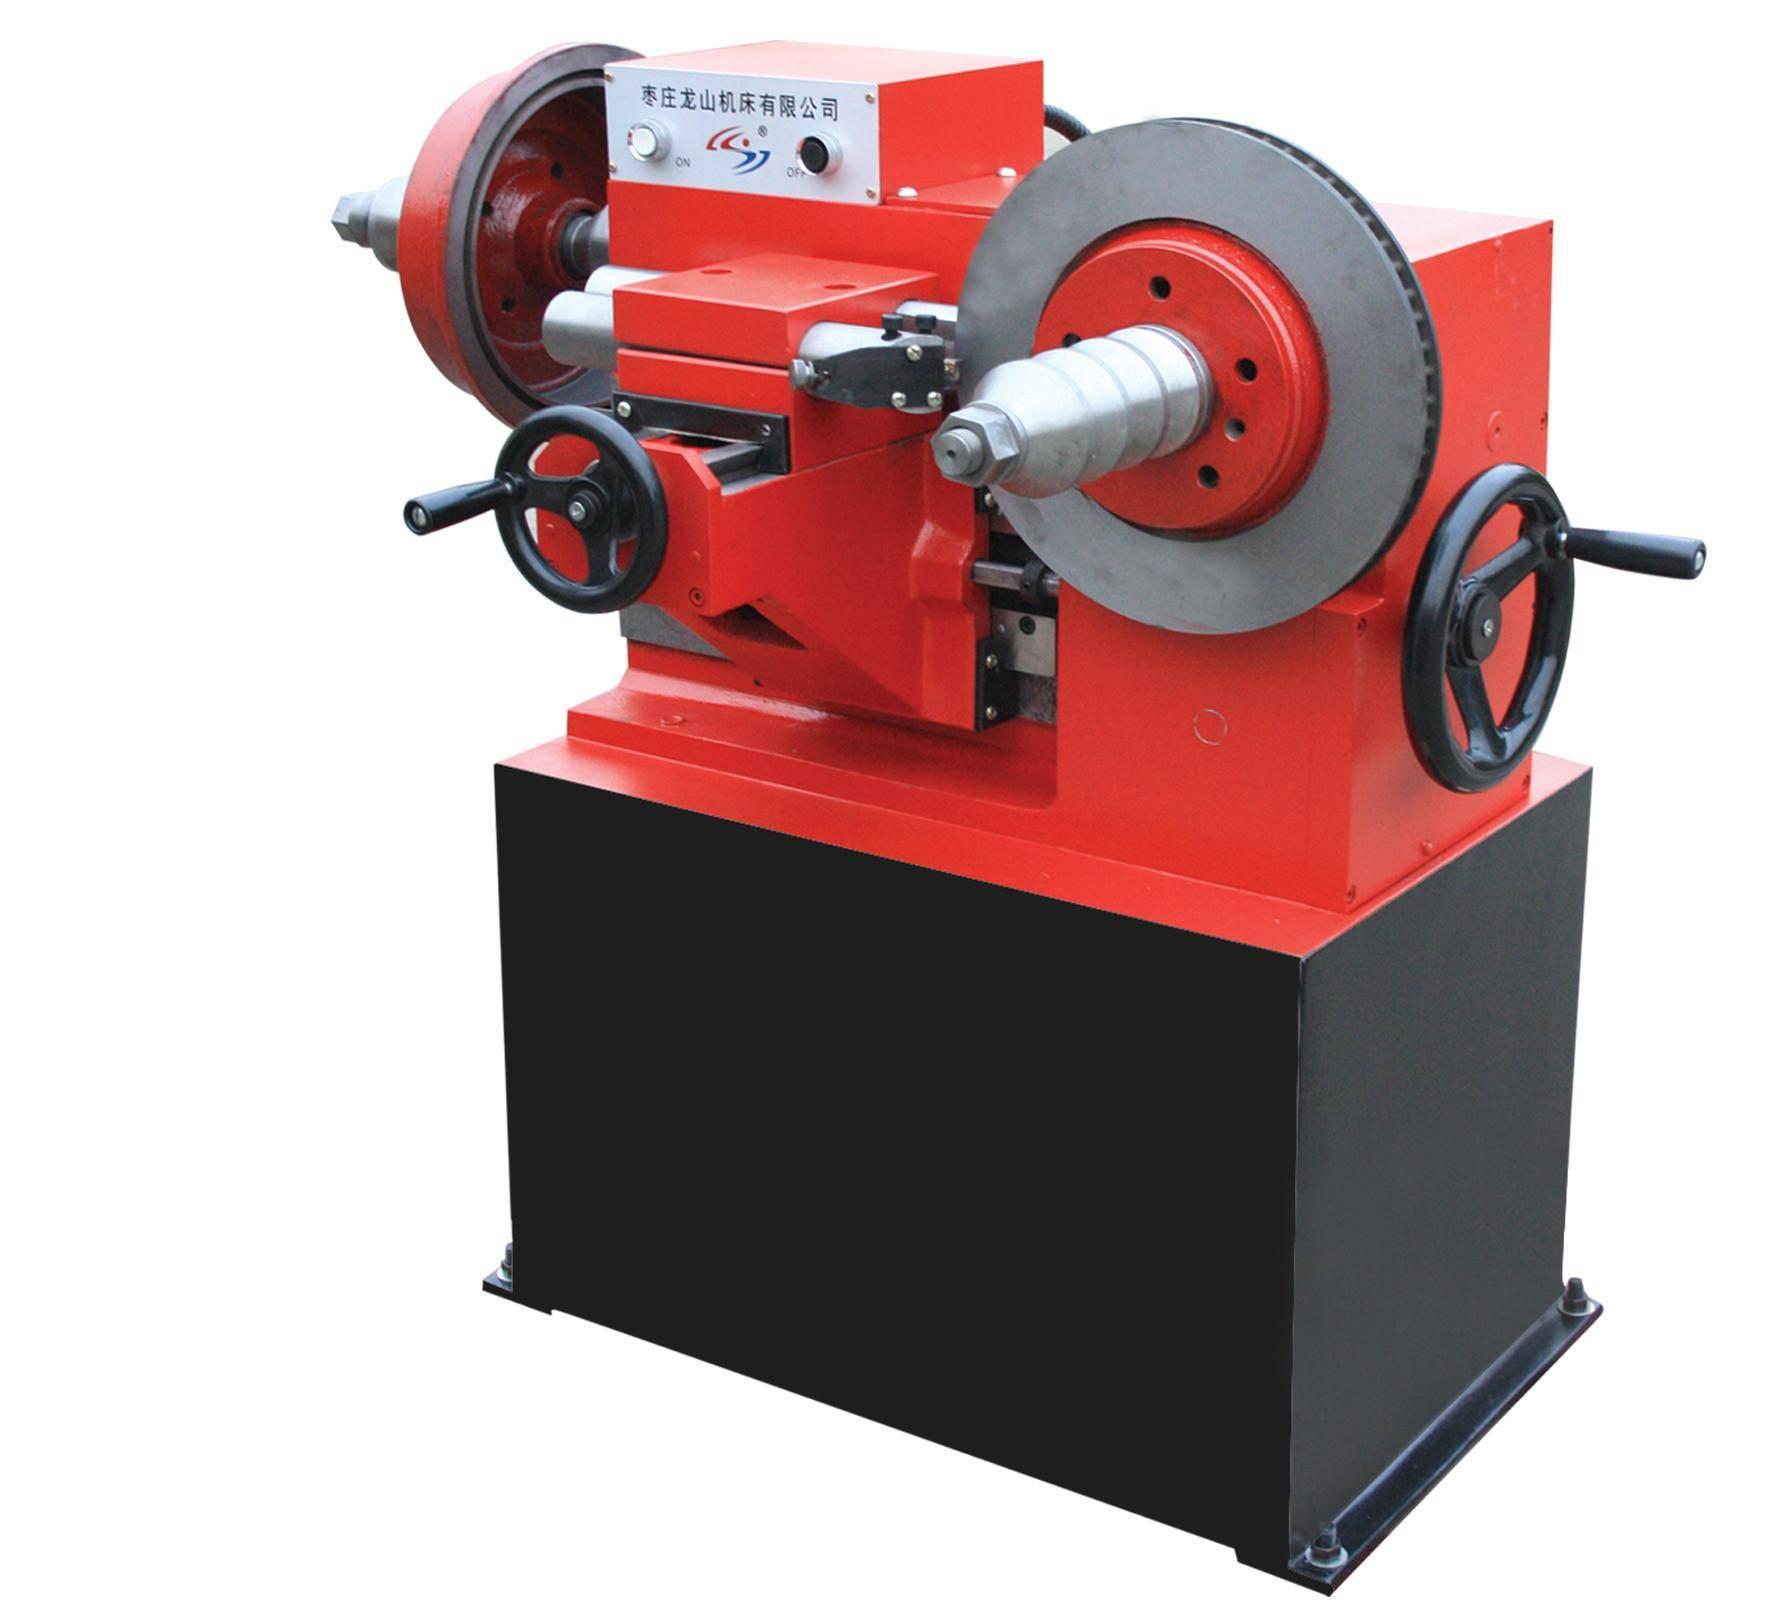 Brake drum/disc cutting machine T8445